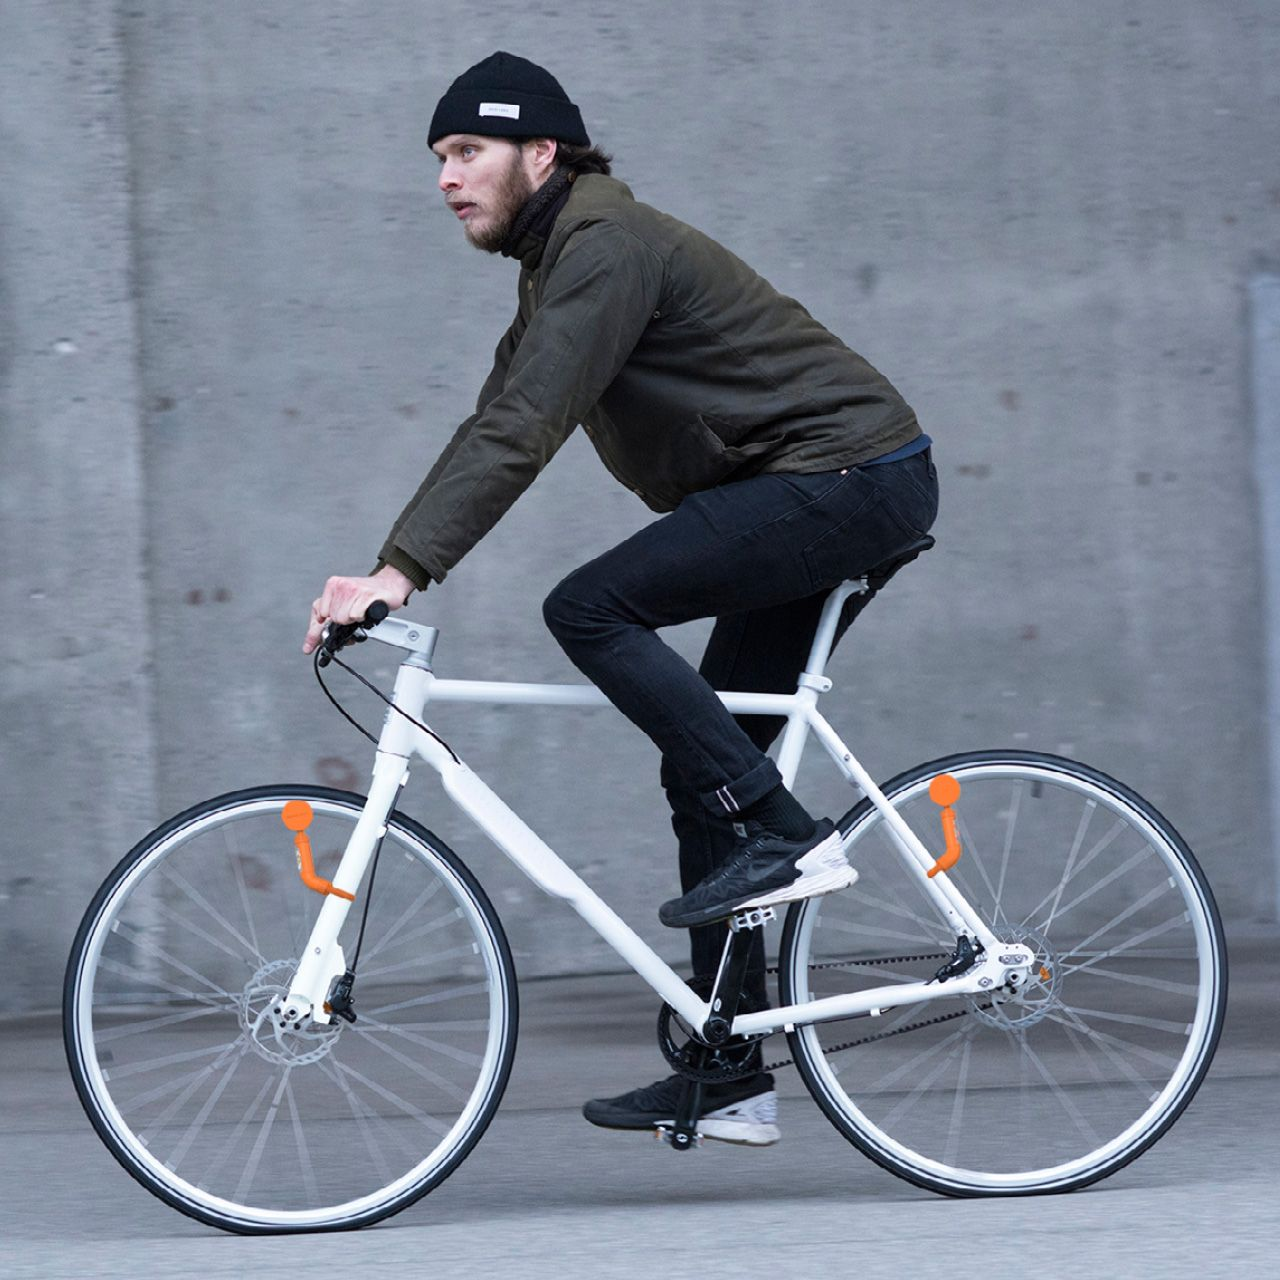 Reelights Neo Bike Lights